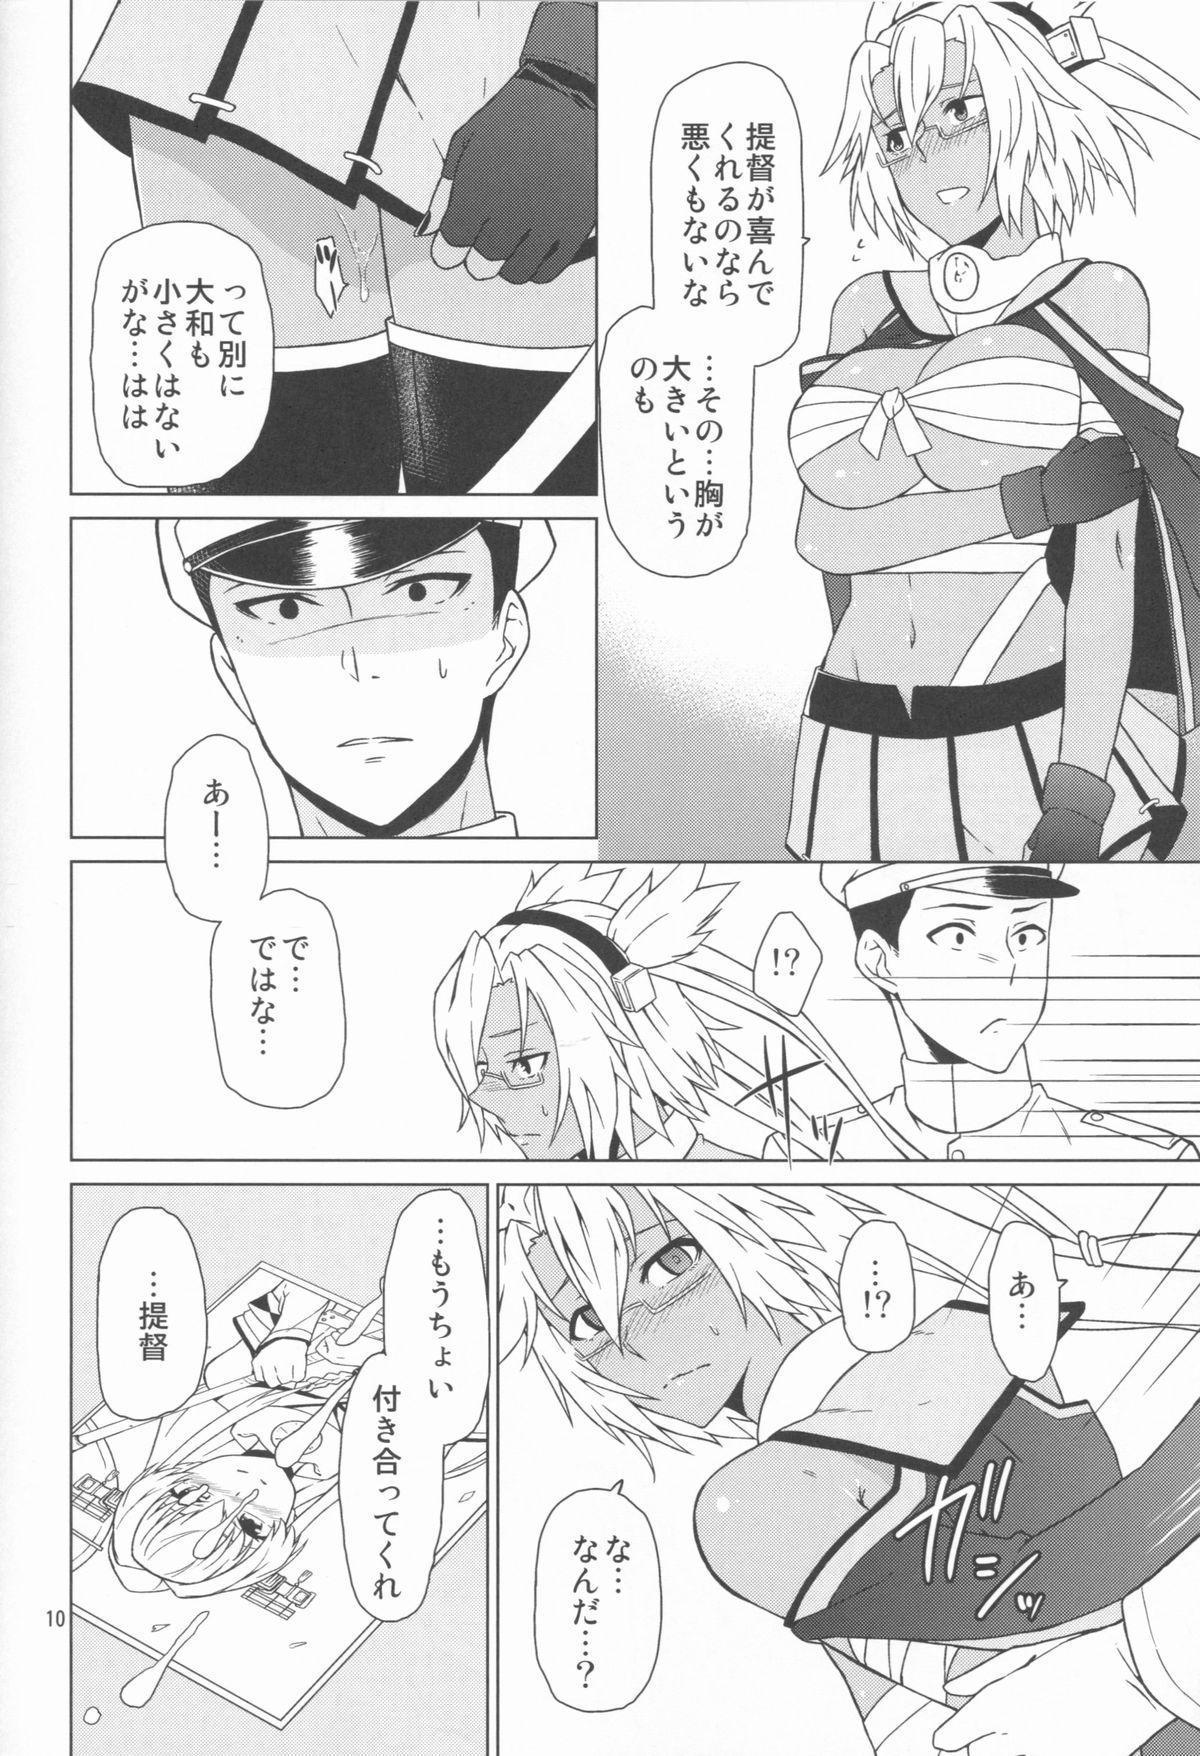 Musashi Route 11